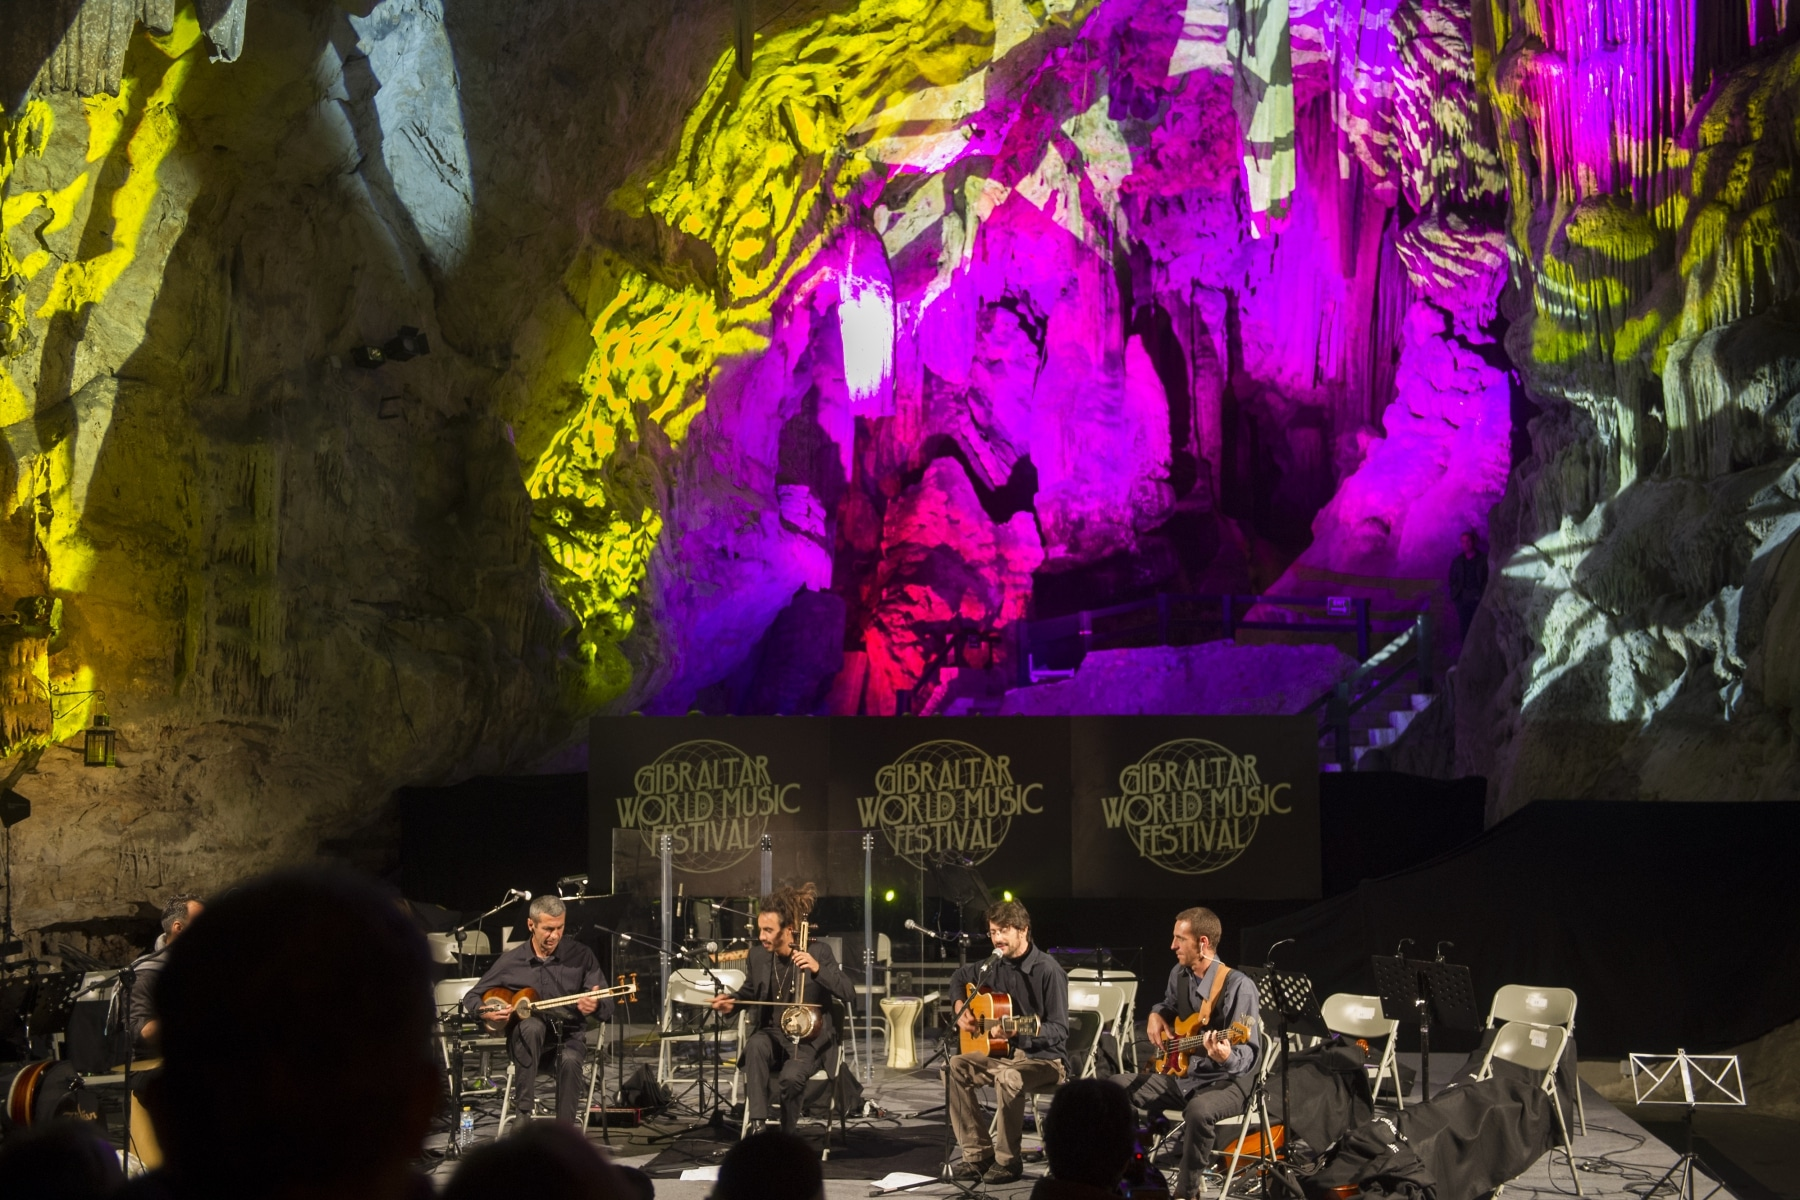 gibraltar-world-music-festival-dia-2-mark-eliyahu-ensemble-07_9222705751_o